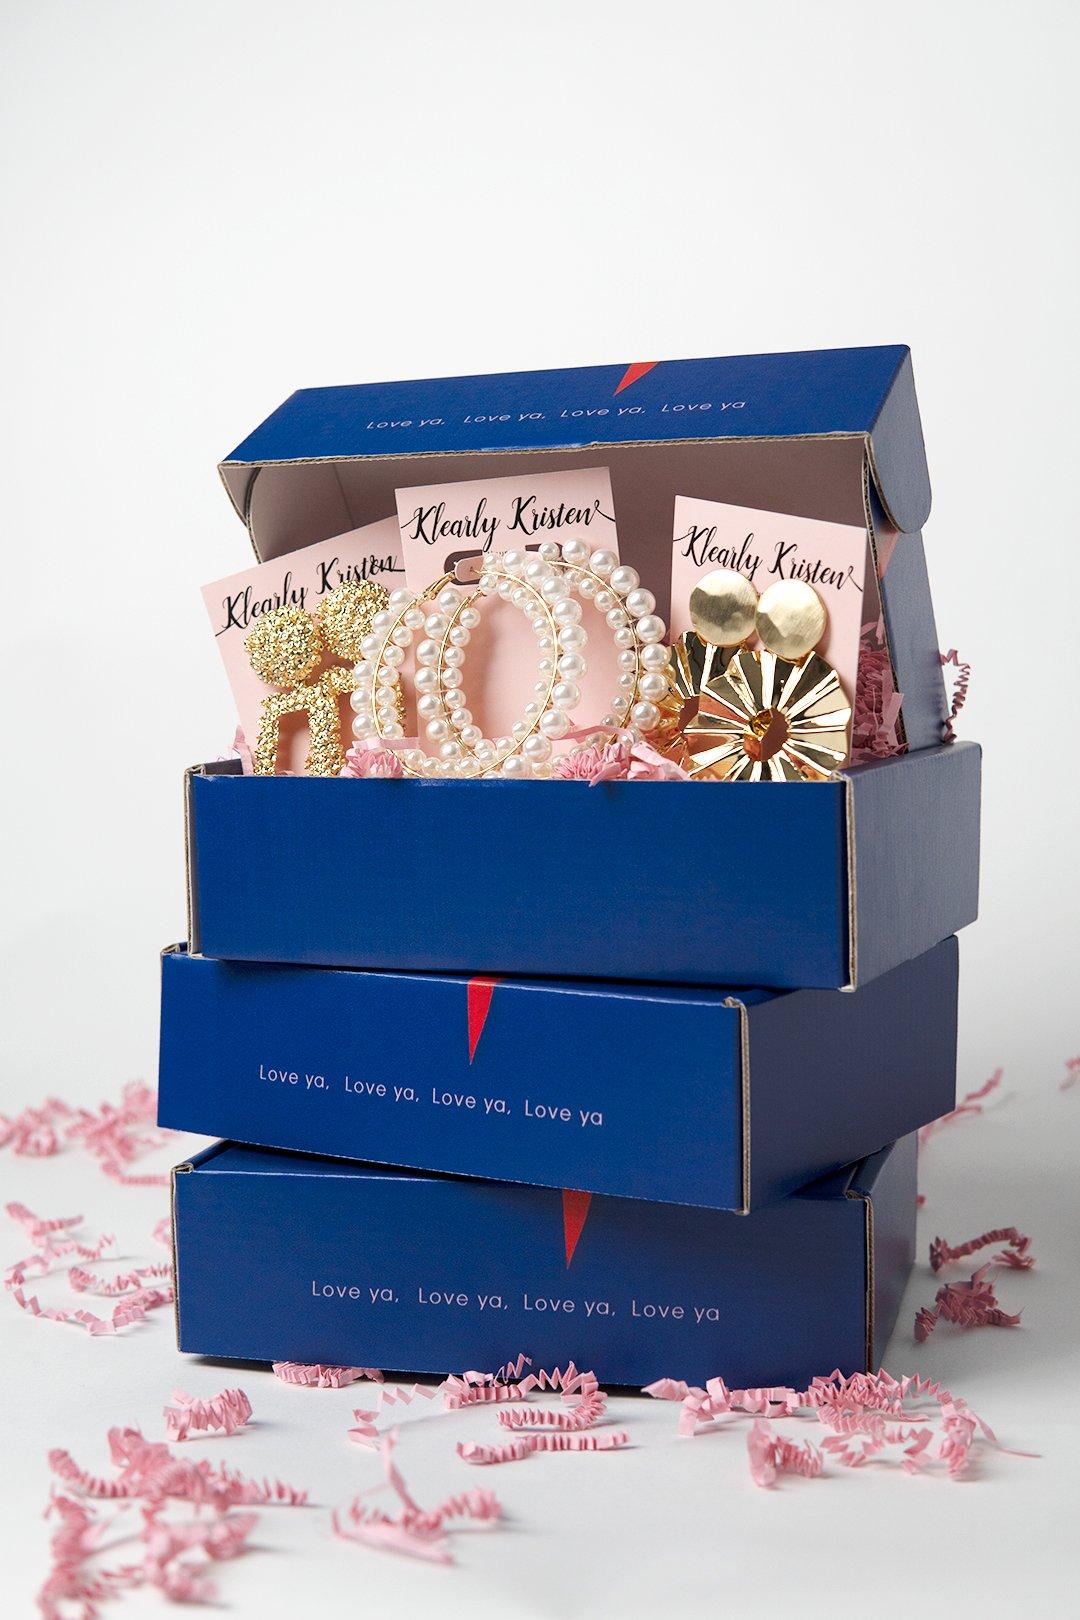 Klearly-Kristen-Box